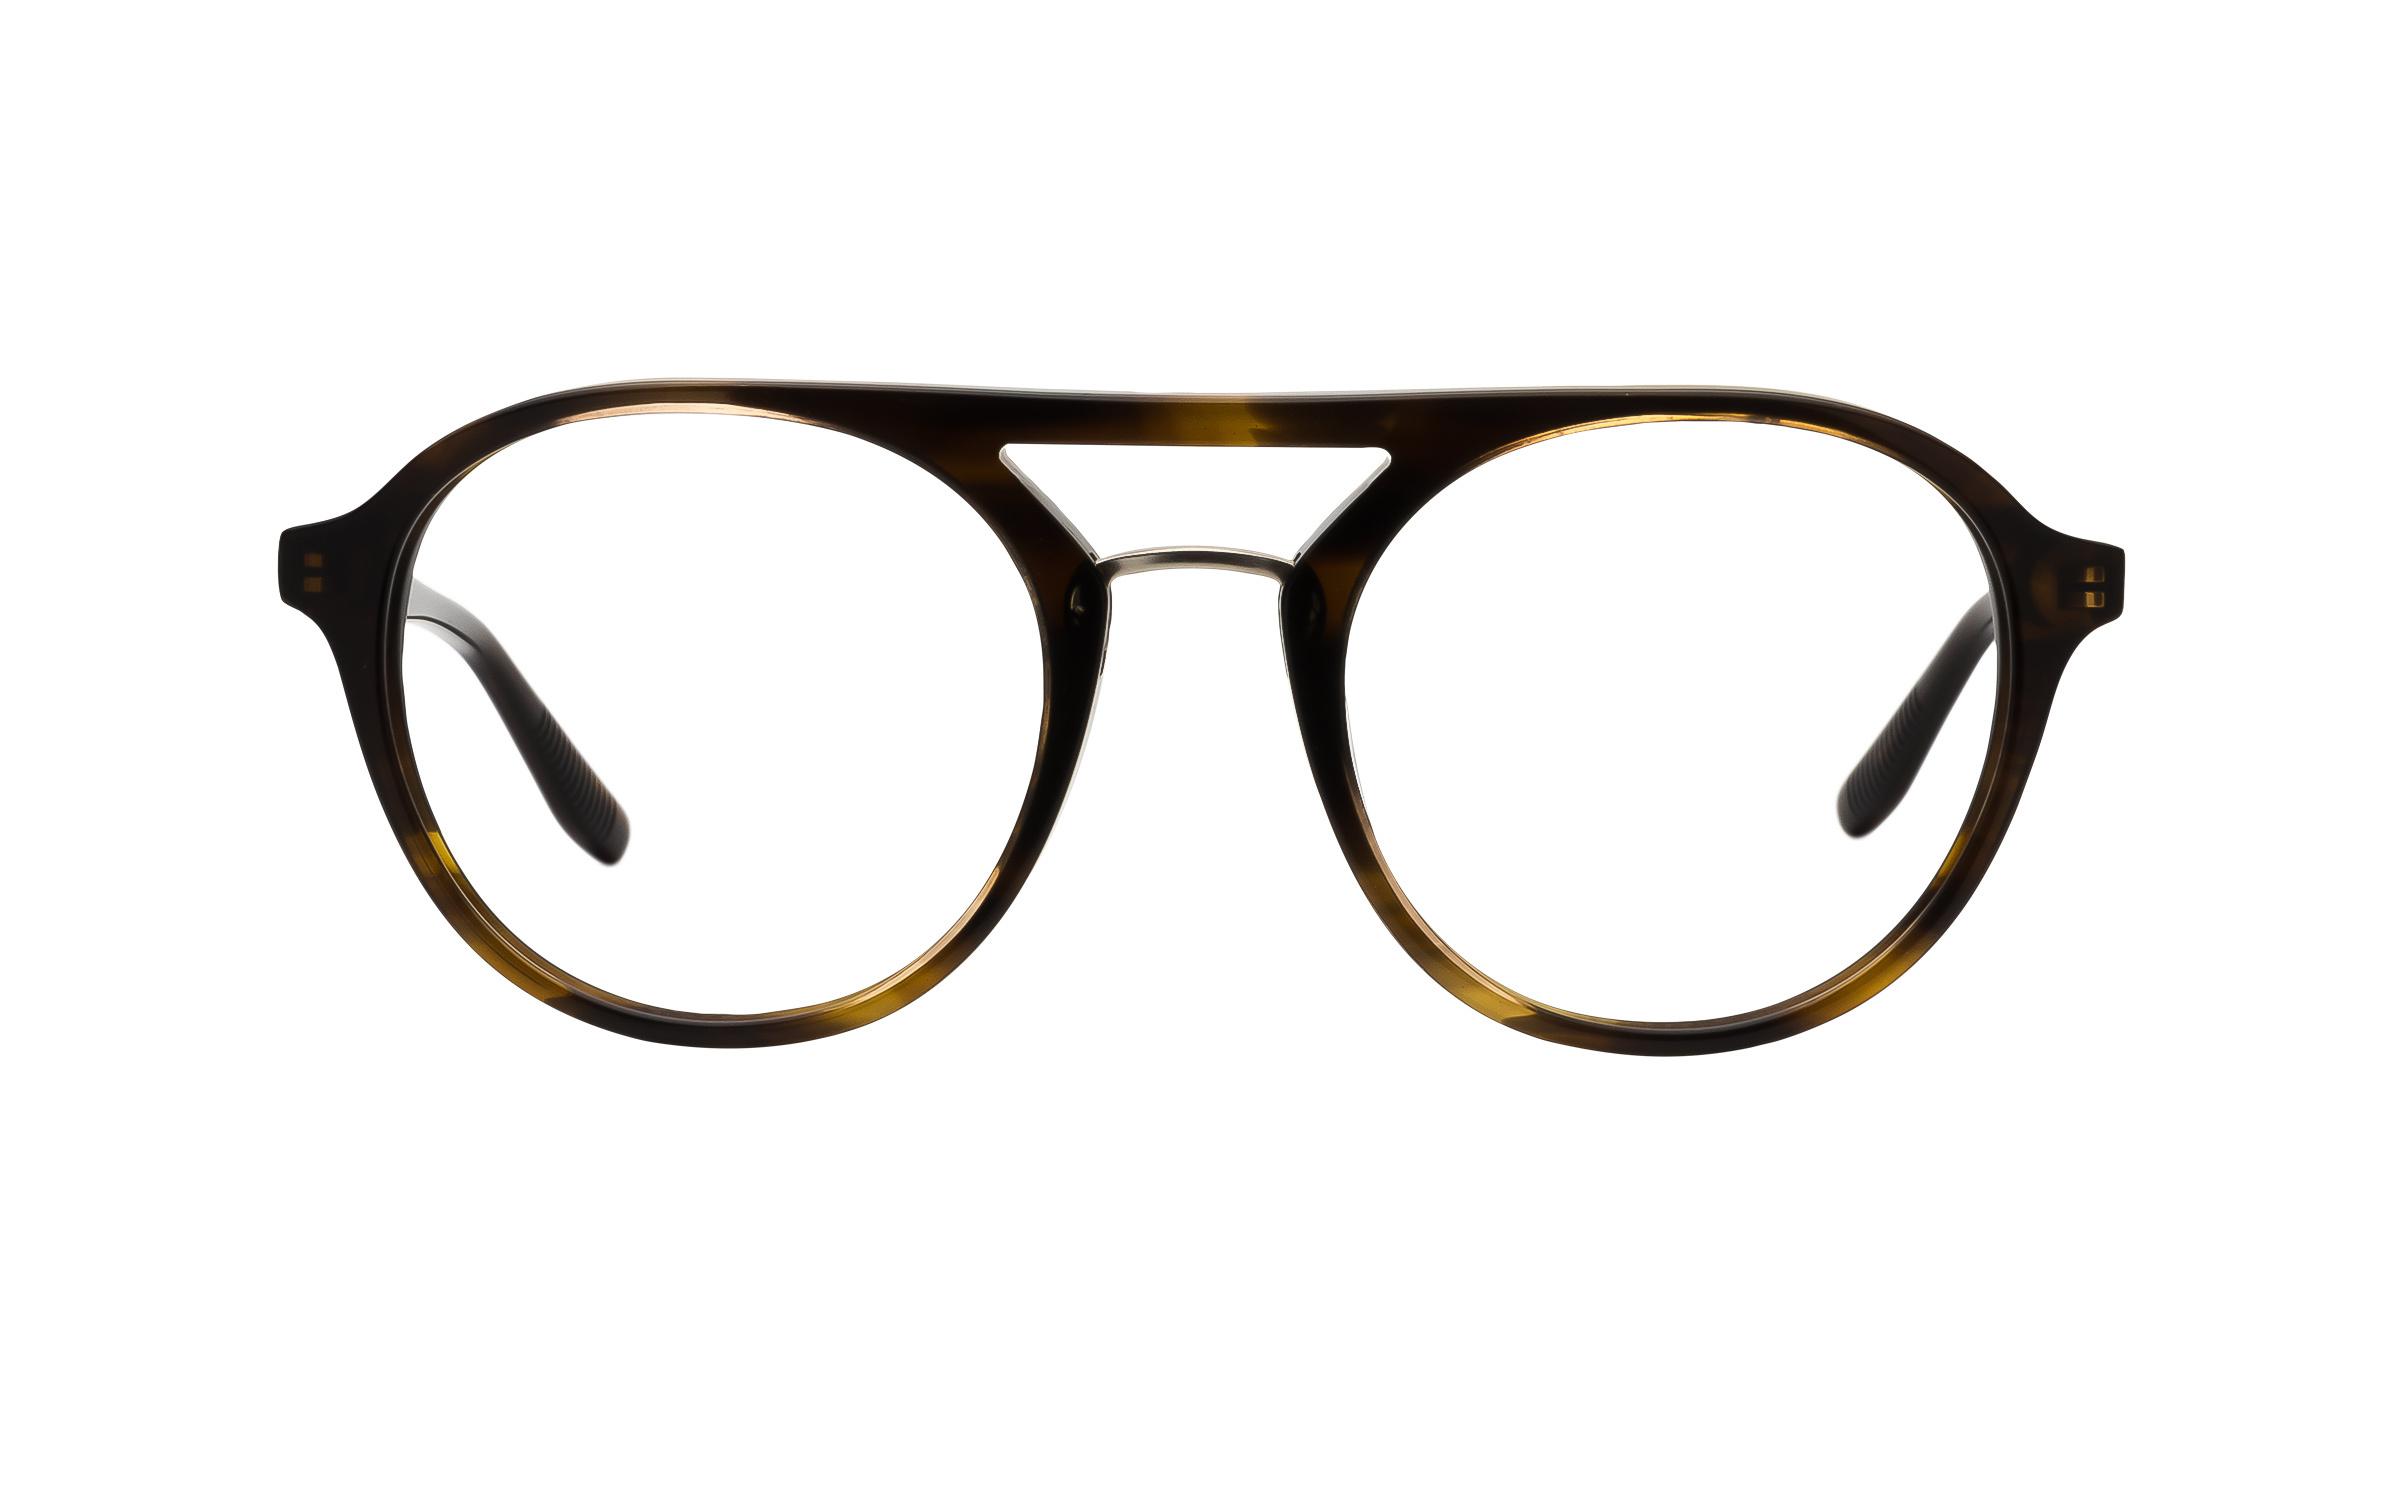 Joseph Marc Men's Glasses Vintage Tortoise/Brown/Green Online Clearly